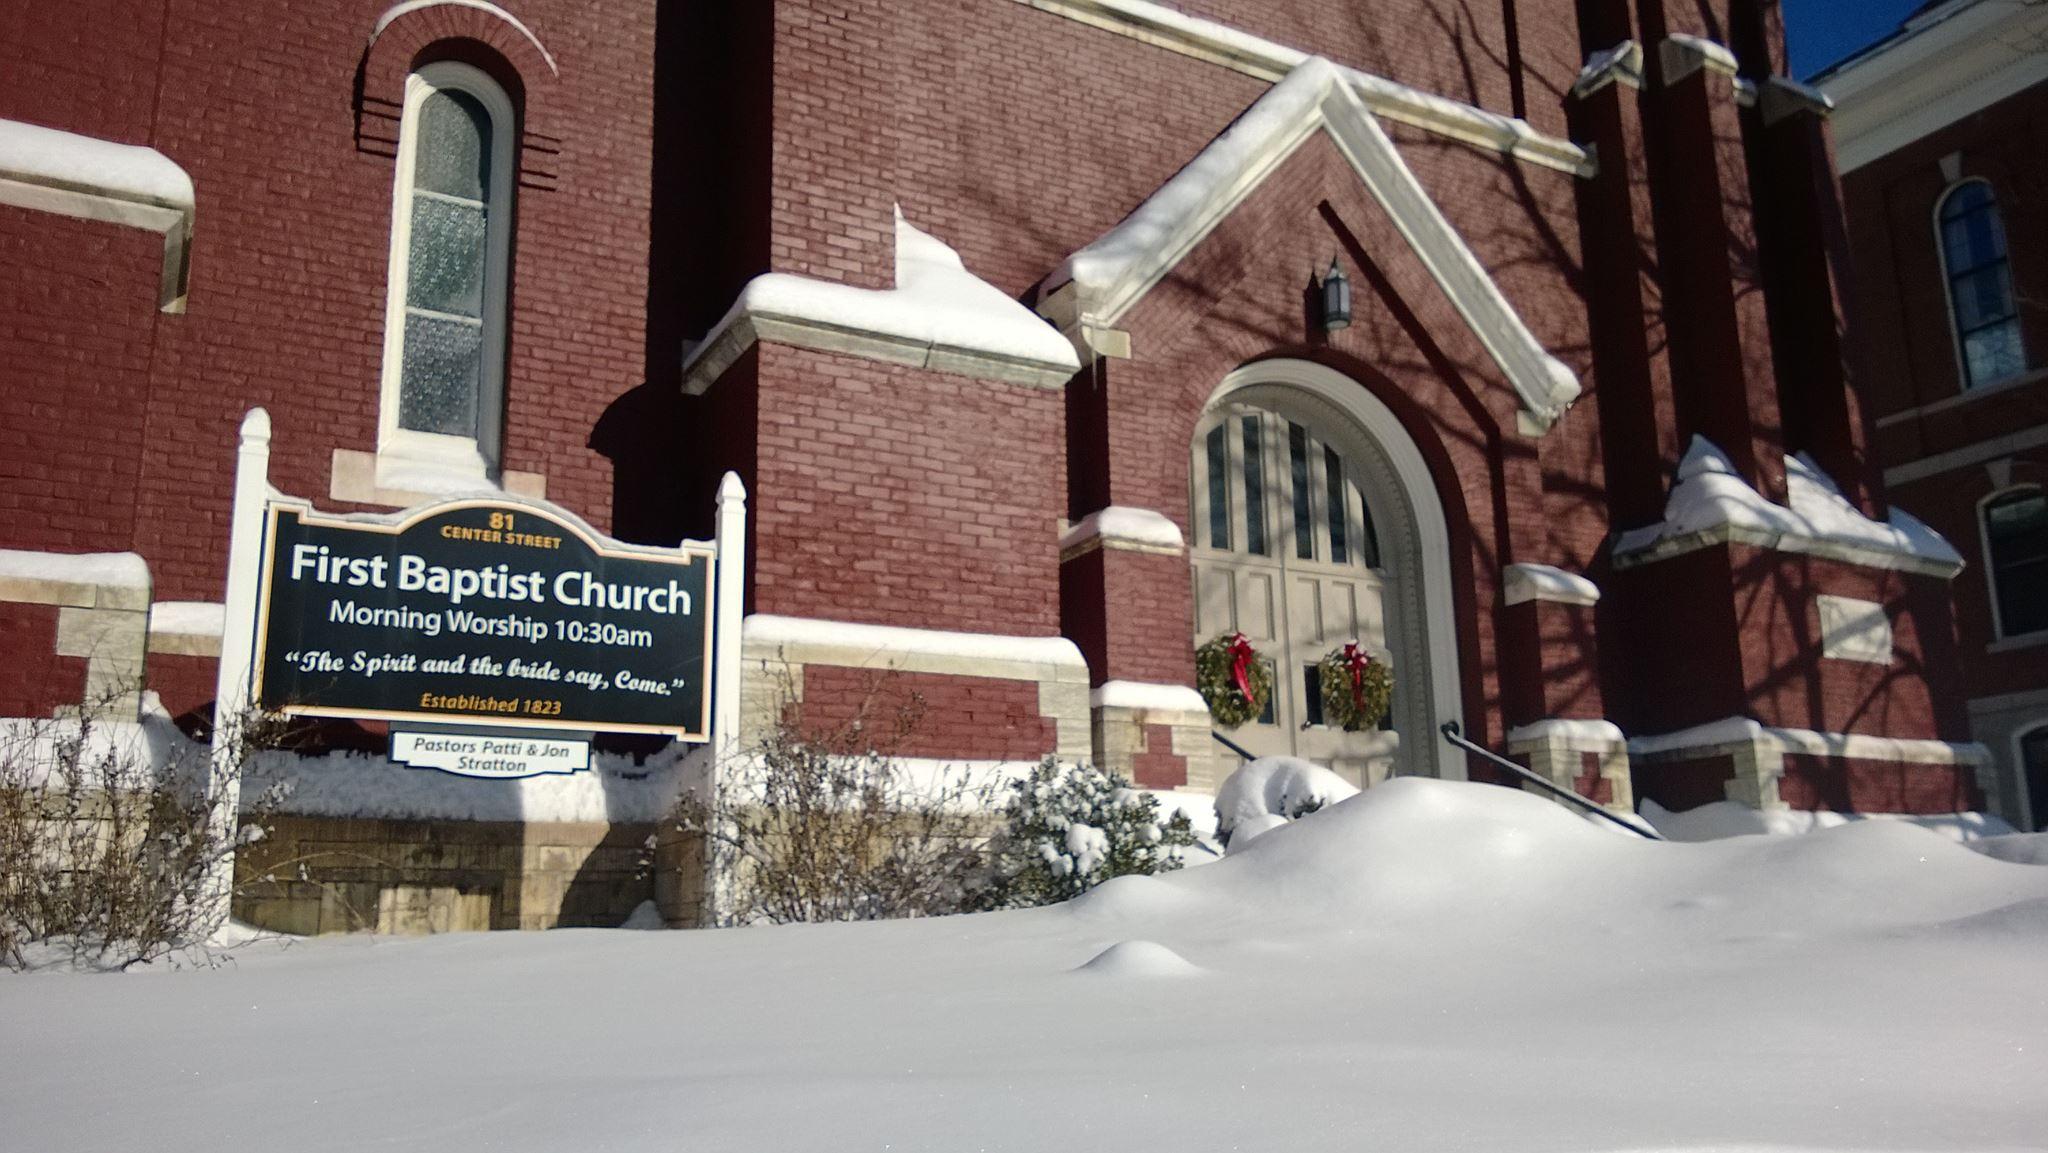 firstbaptist_sign.jpg